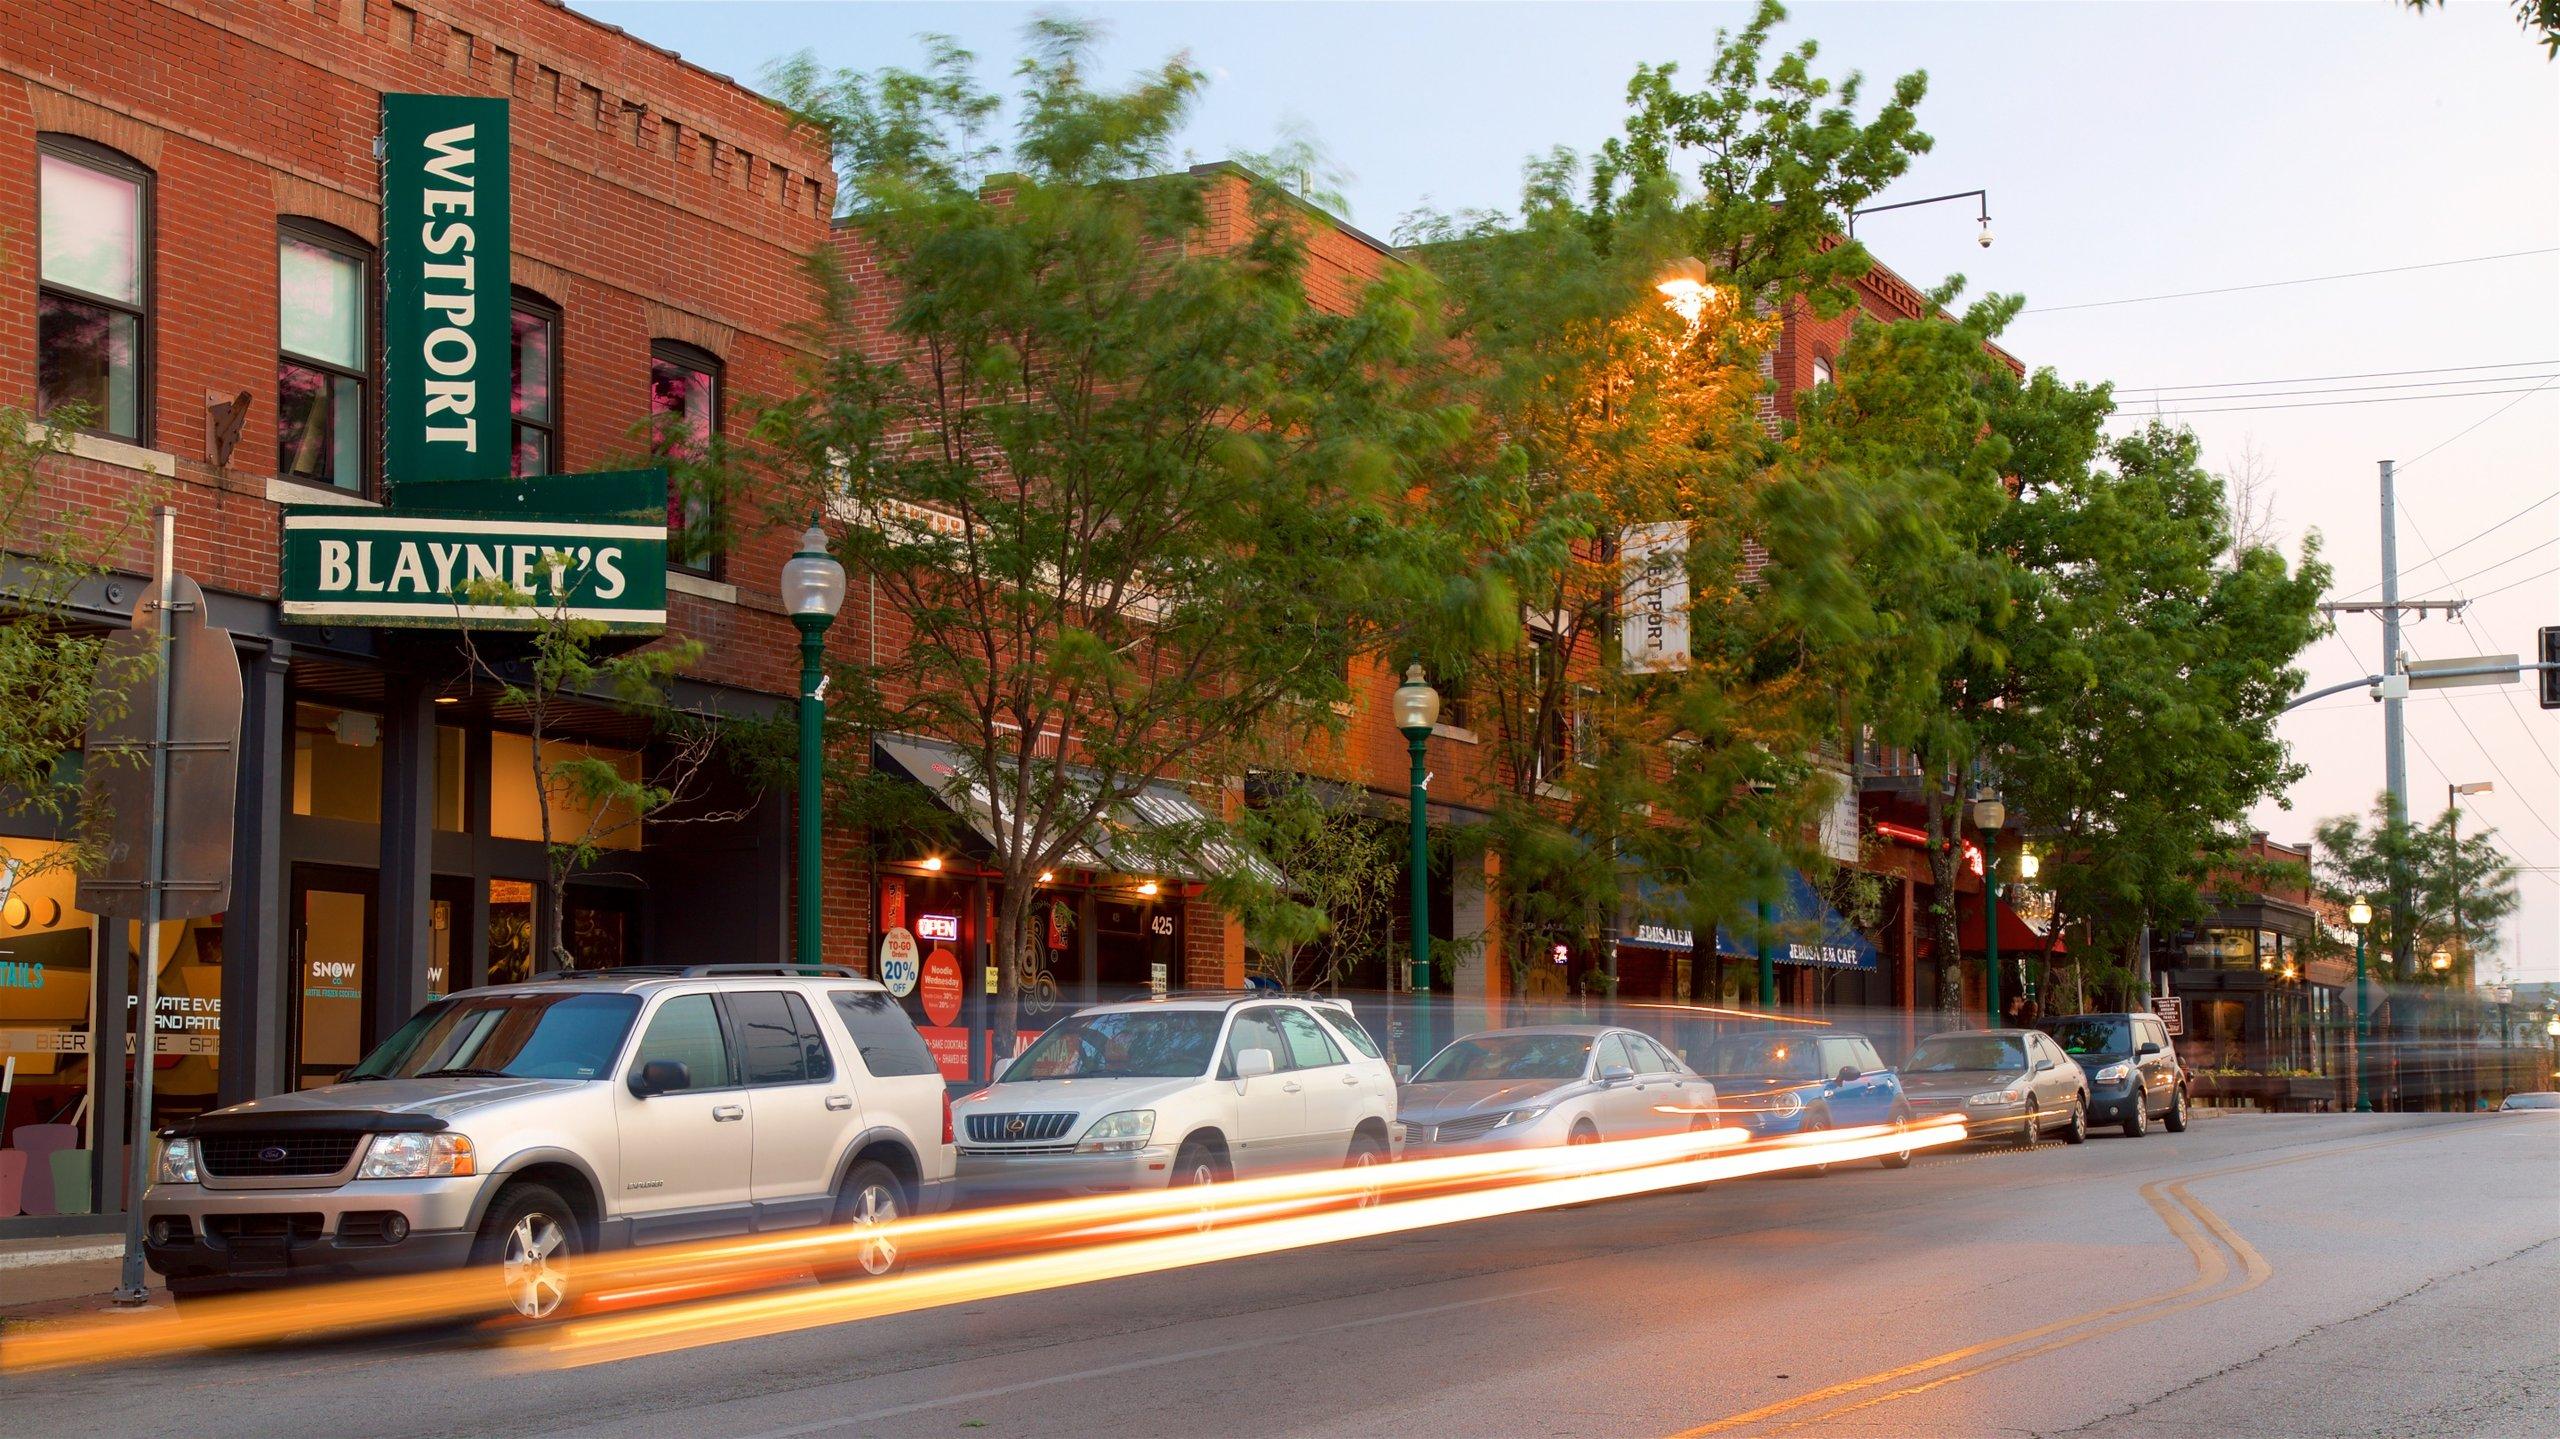 Westport, Kansas City, Missouri, United States of America